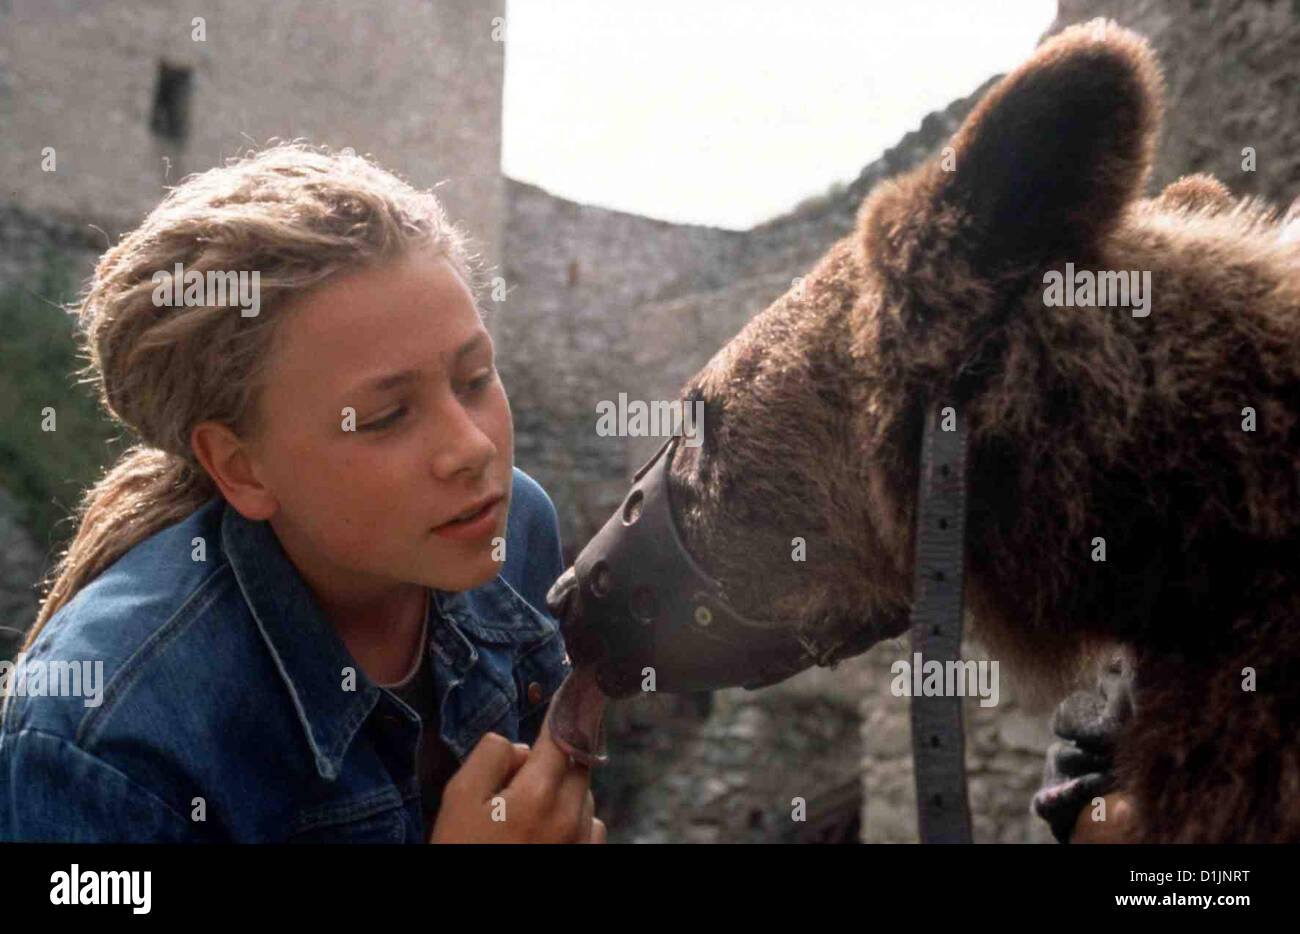 Picture of max riemelt - Der Baer Ist Los B R Ist Los Der Max Riemelt Joschka Local Caption 2000 Senator Film